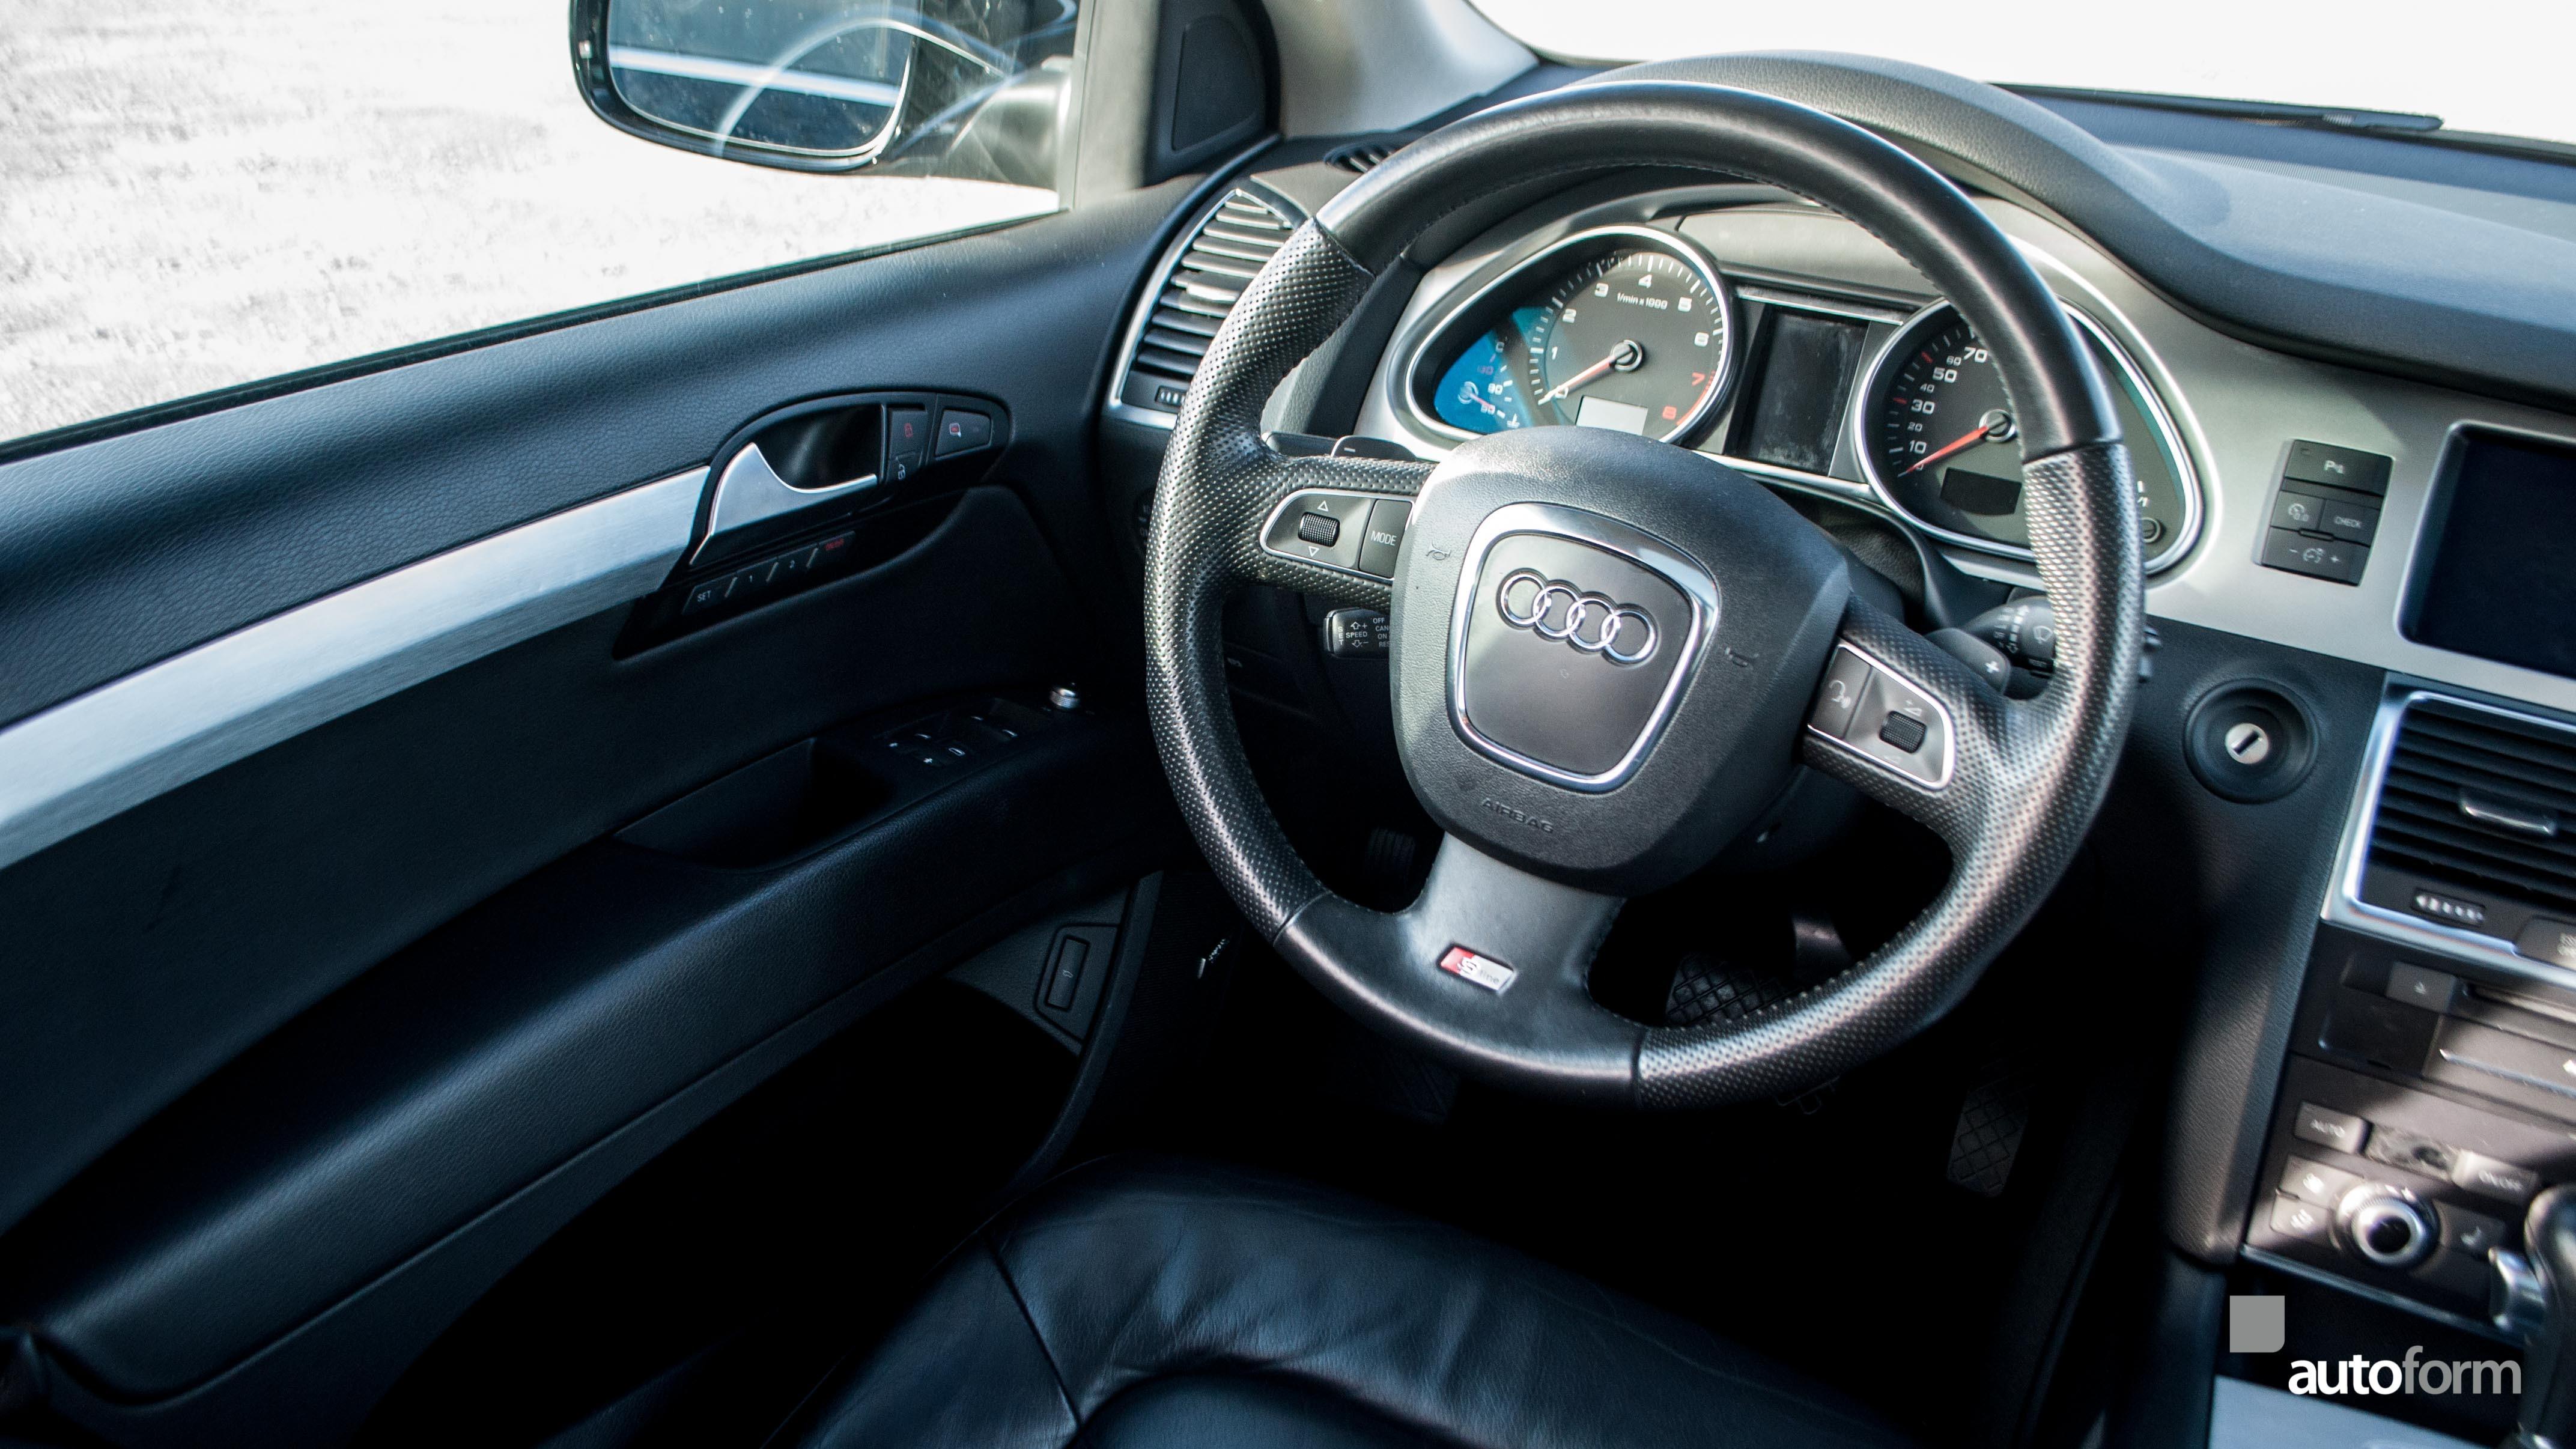 2010 Audi Q7 4 2 Prestige S Line Autoform